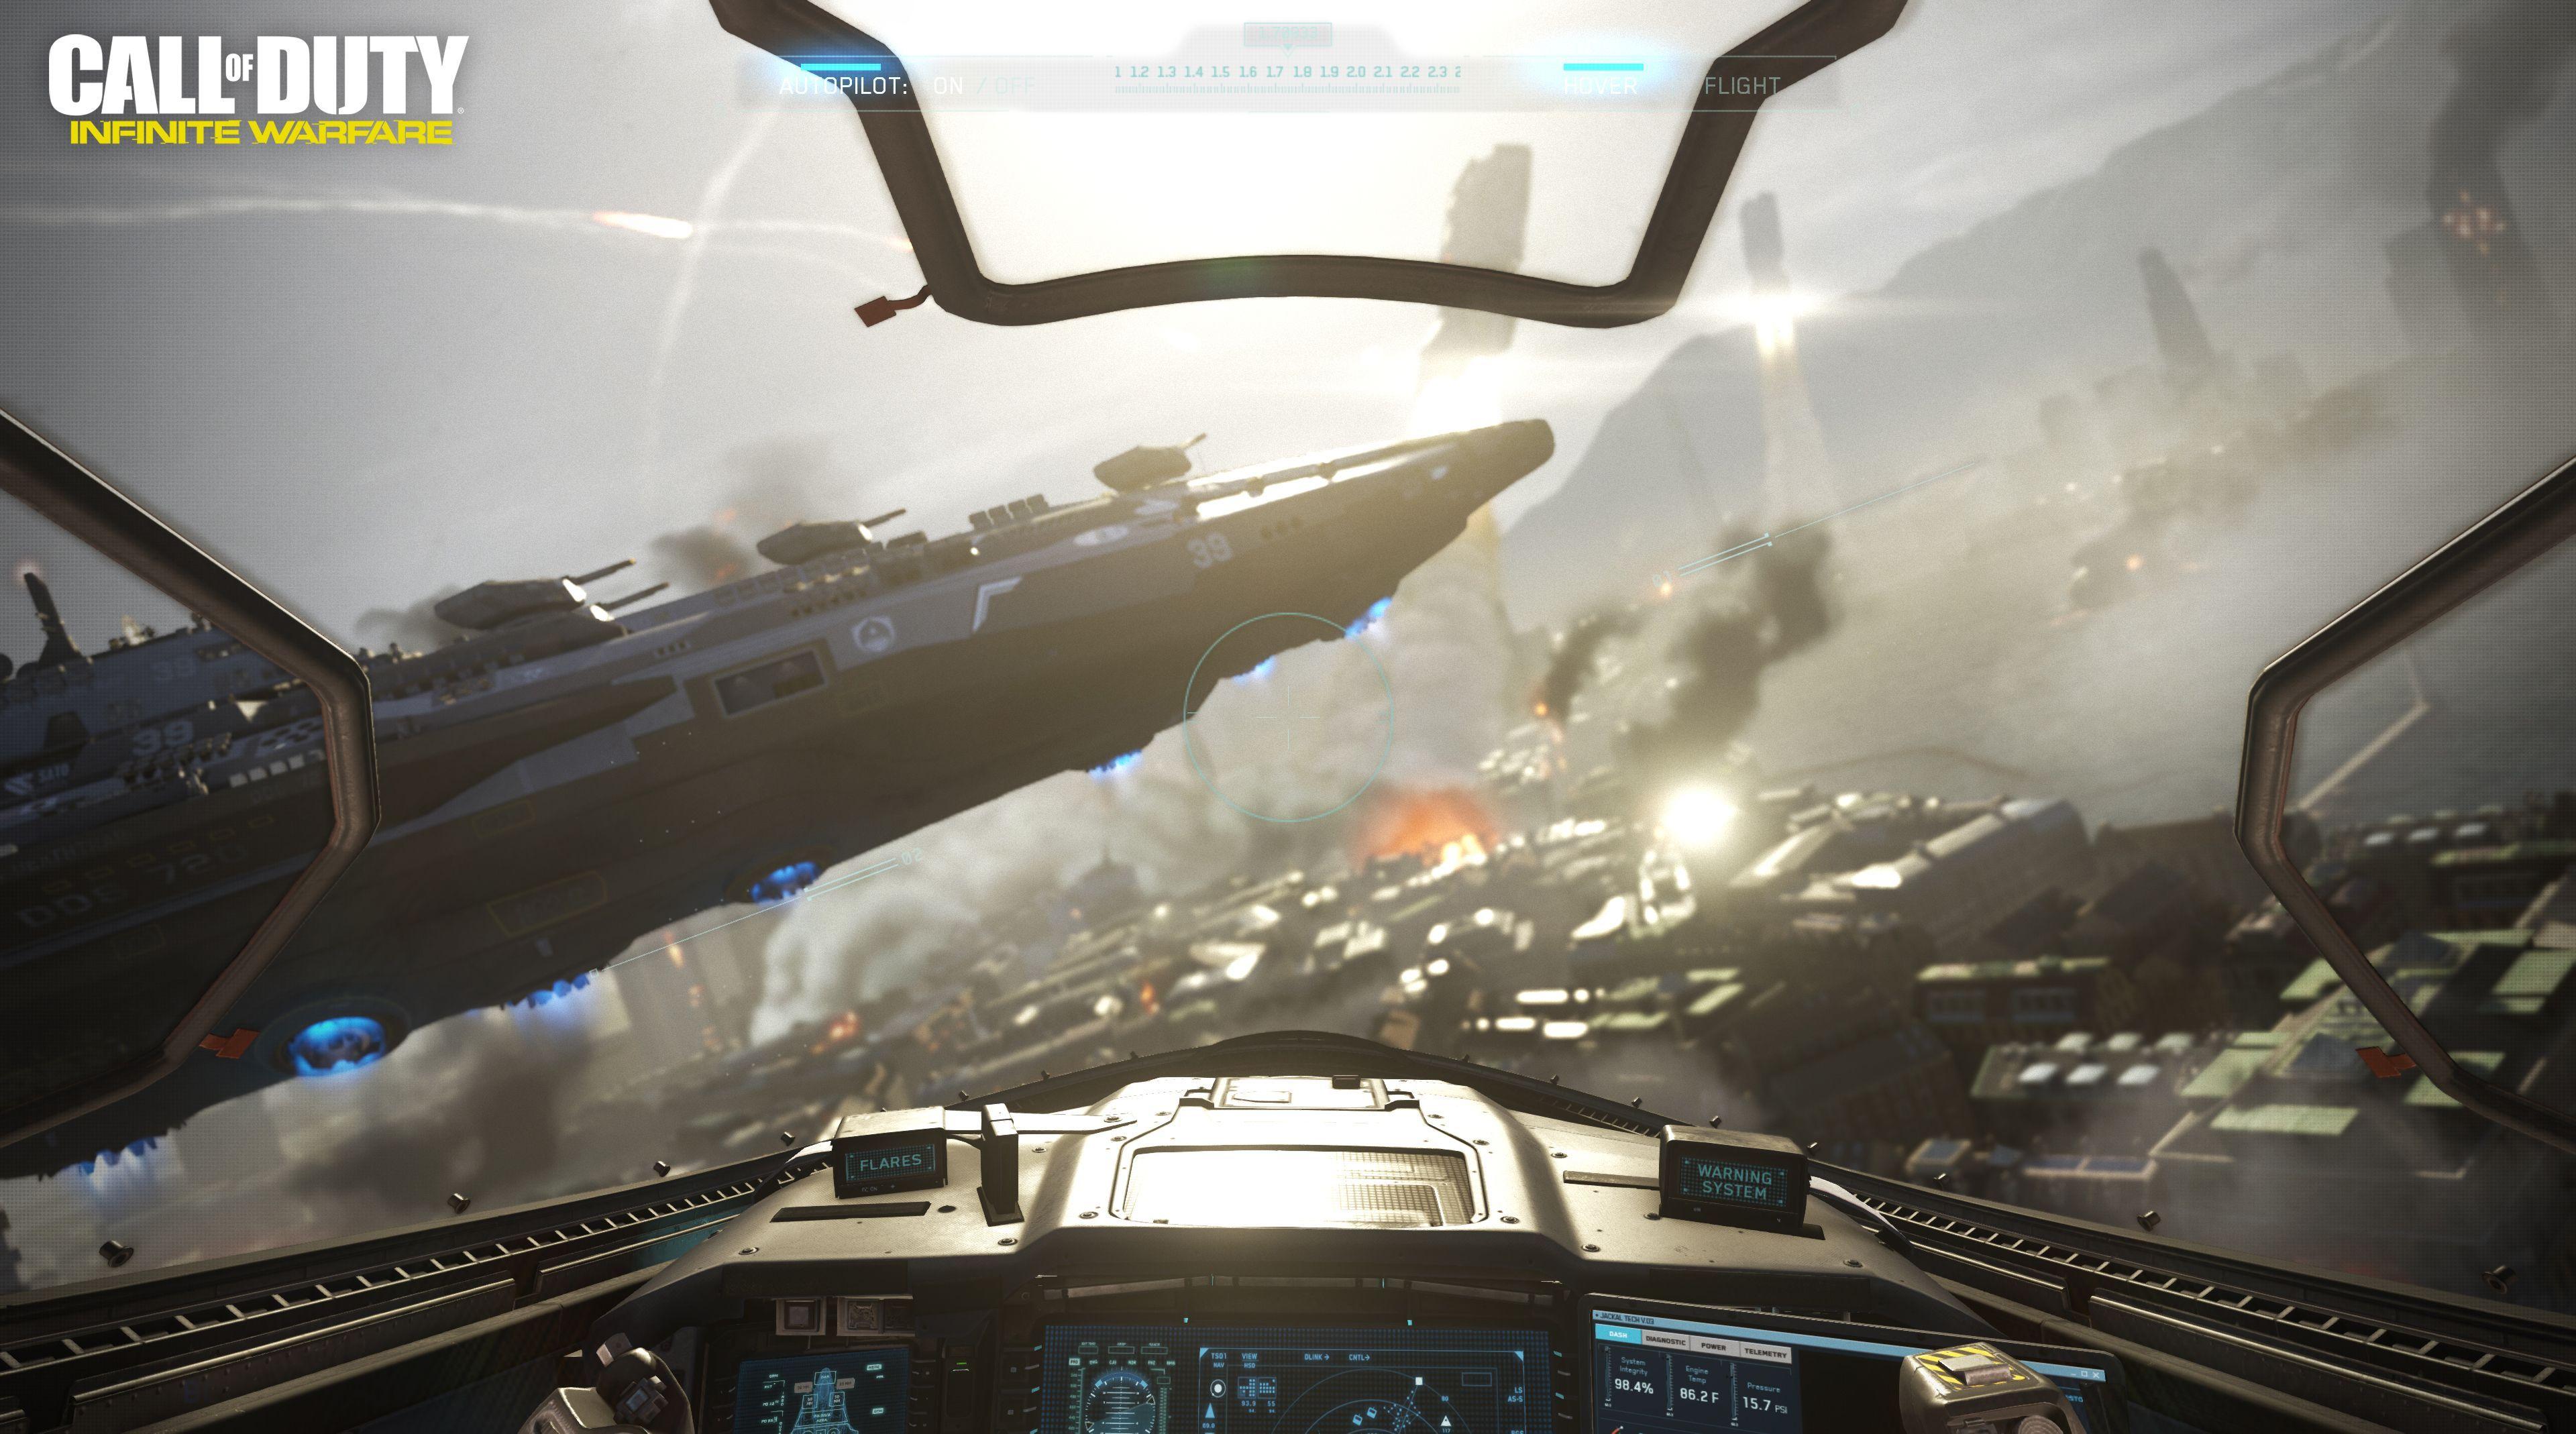 Call of duty infinite warfare ship assault e3 demo screenrant - Infinite warfare ship assault ...